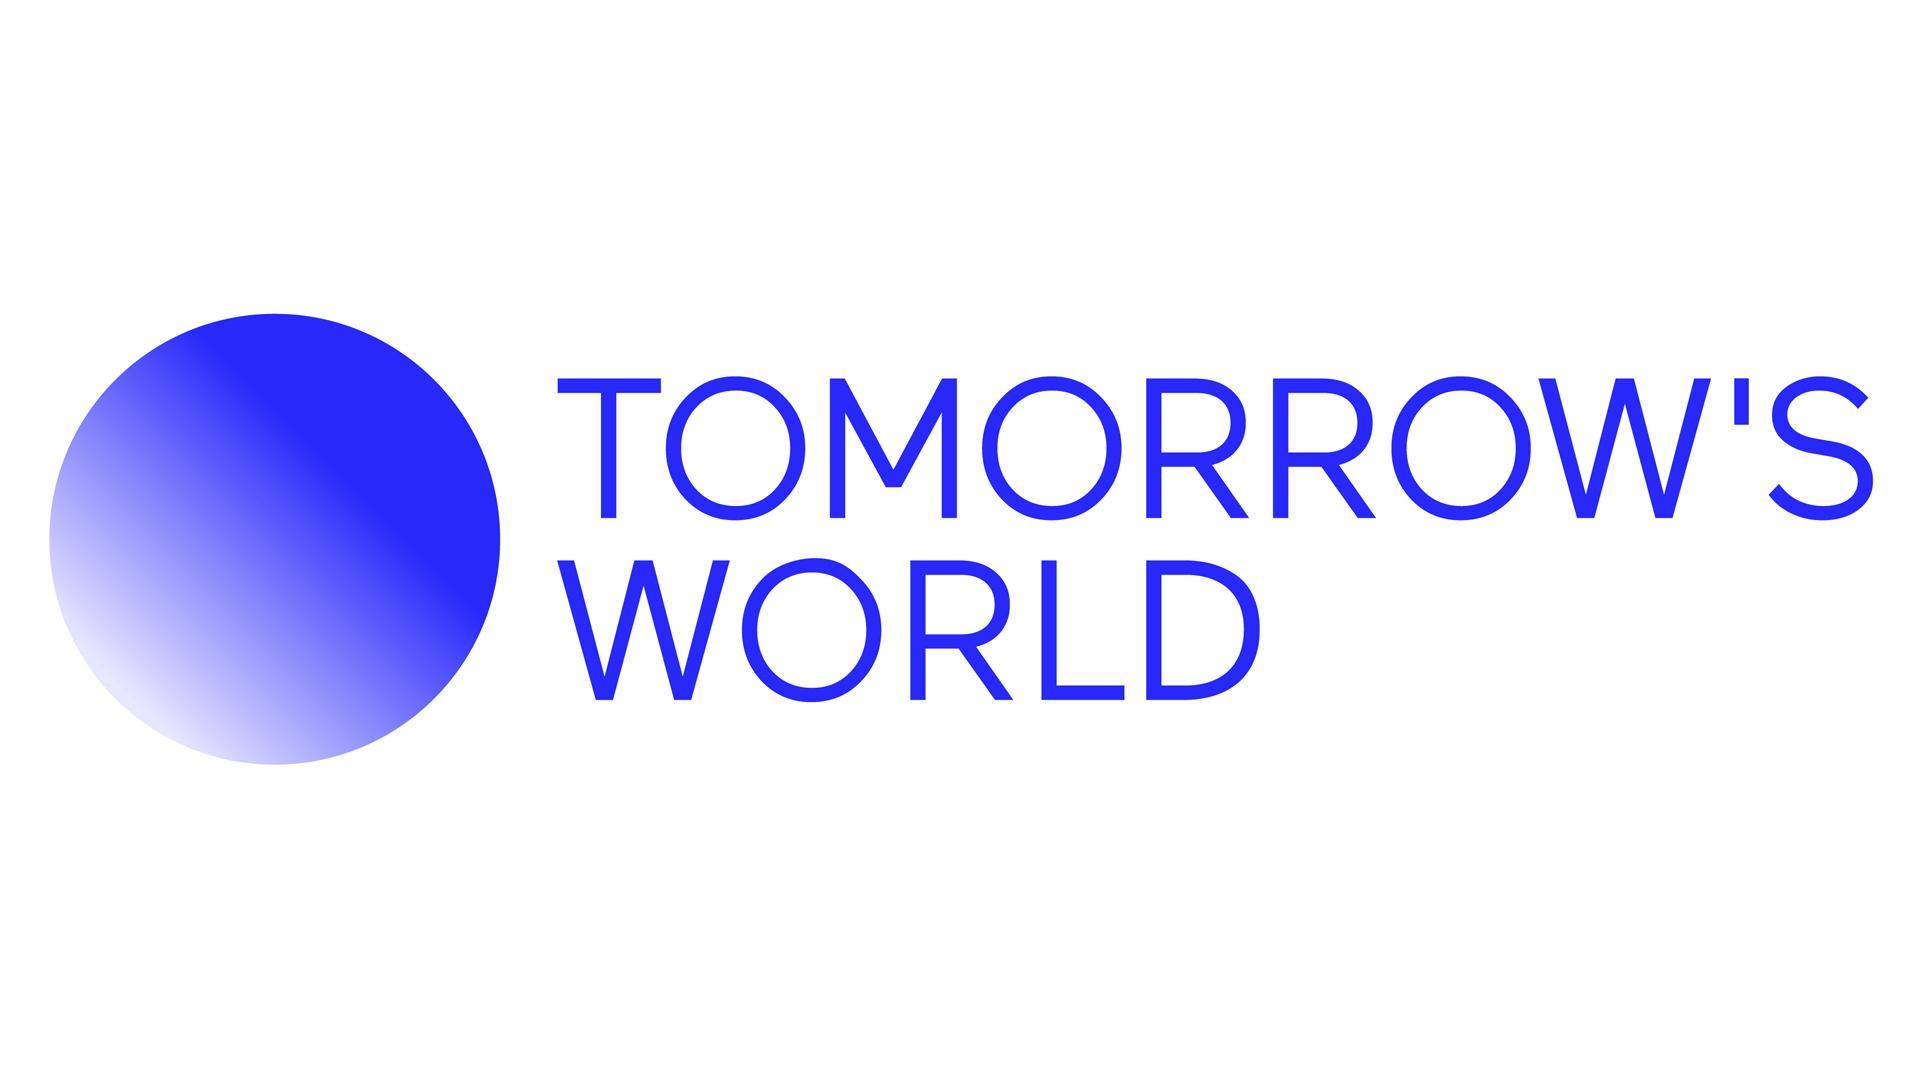 bromsgrove_tomorrows-world_logo_0617_el-gr.jpg